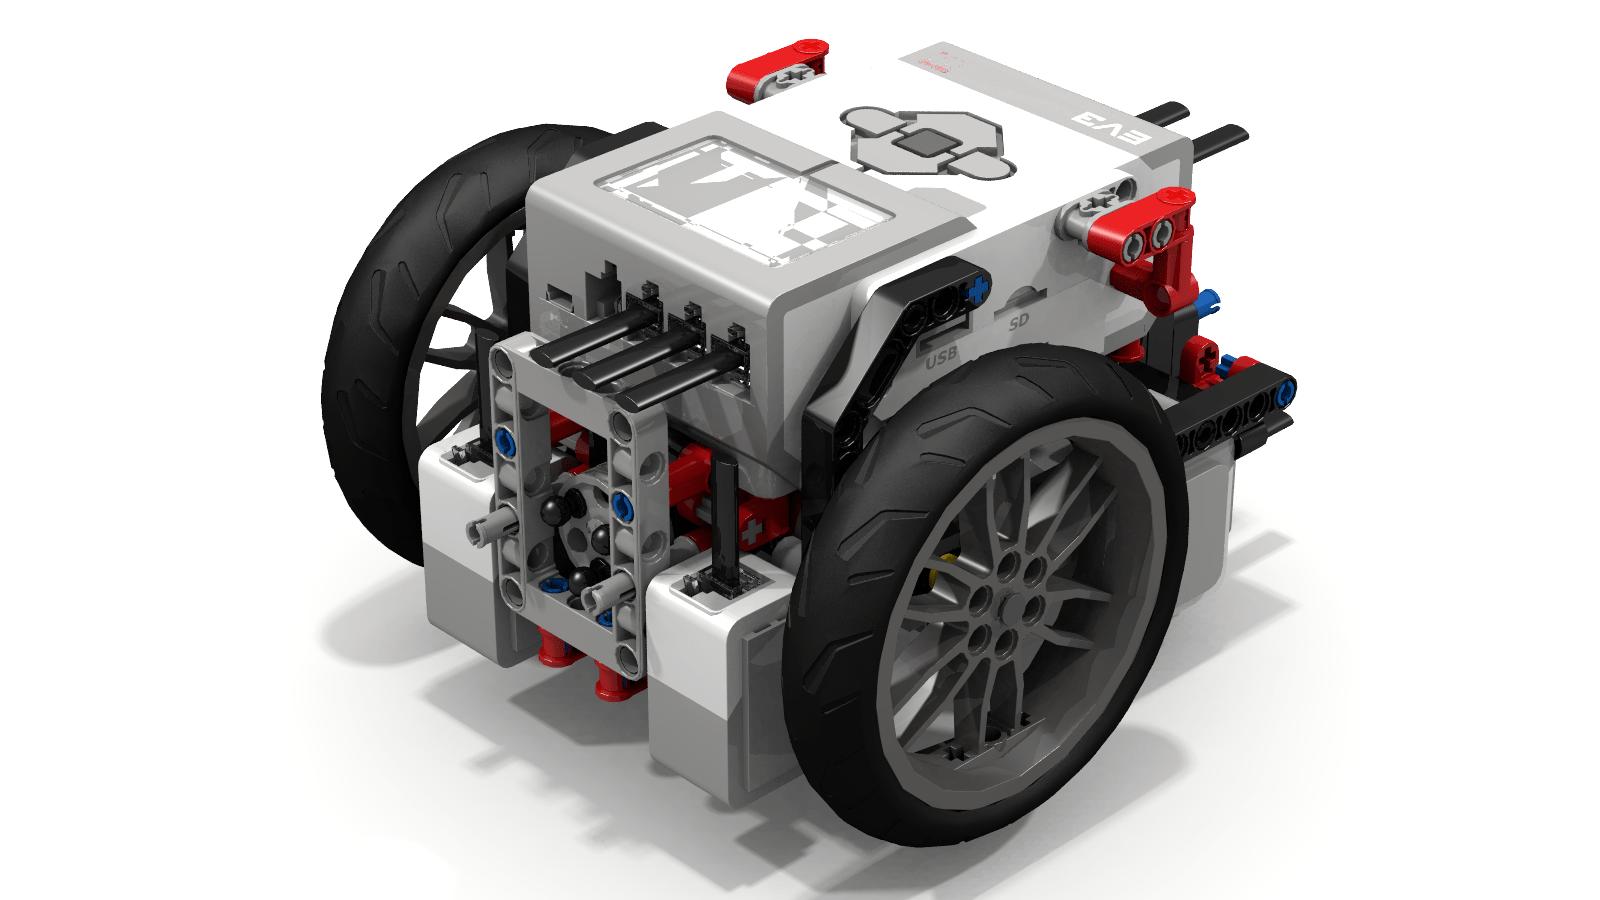 ev3 robot building instructions